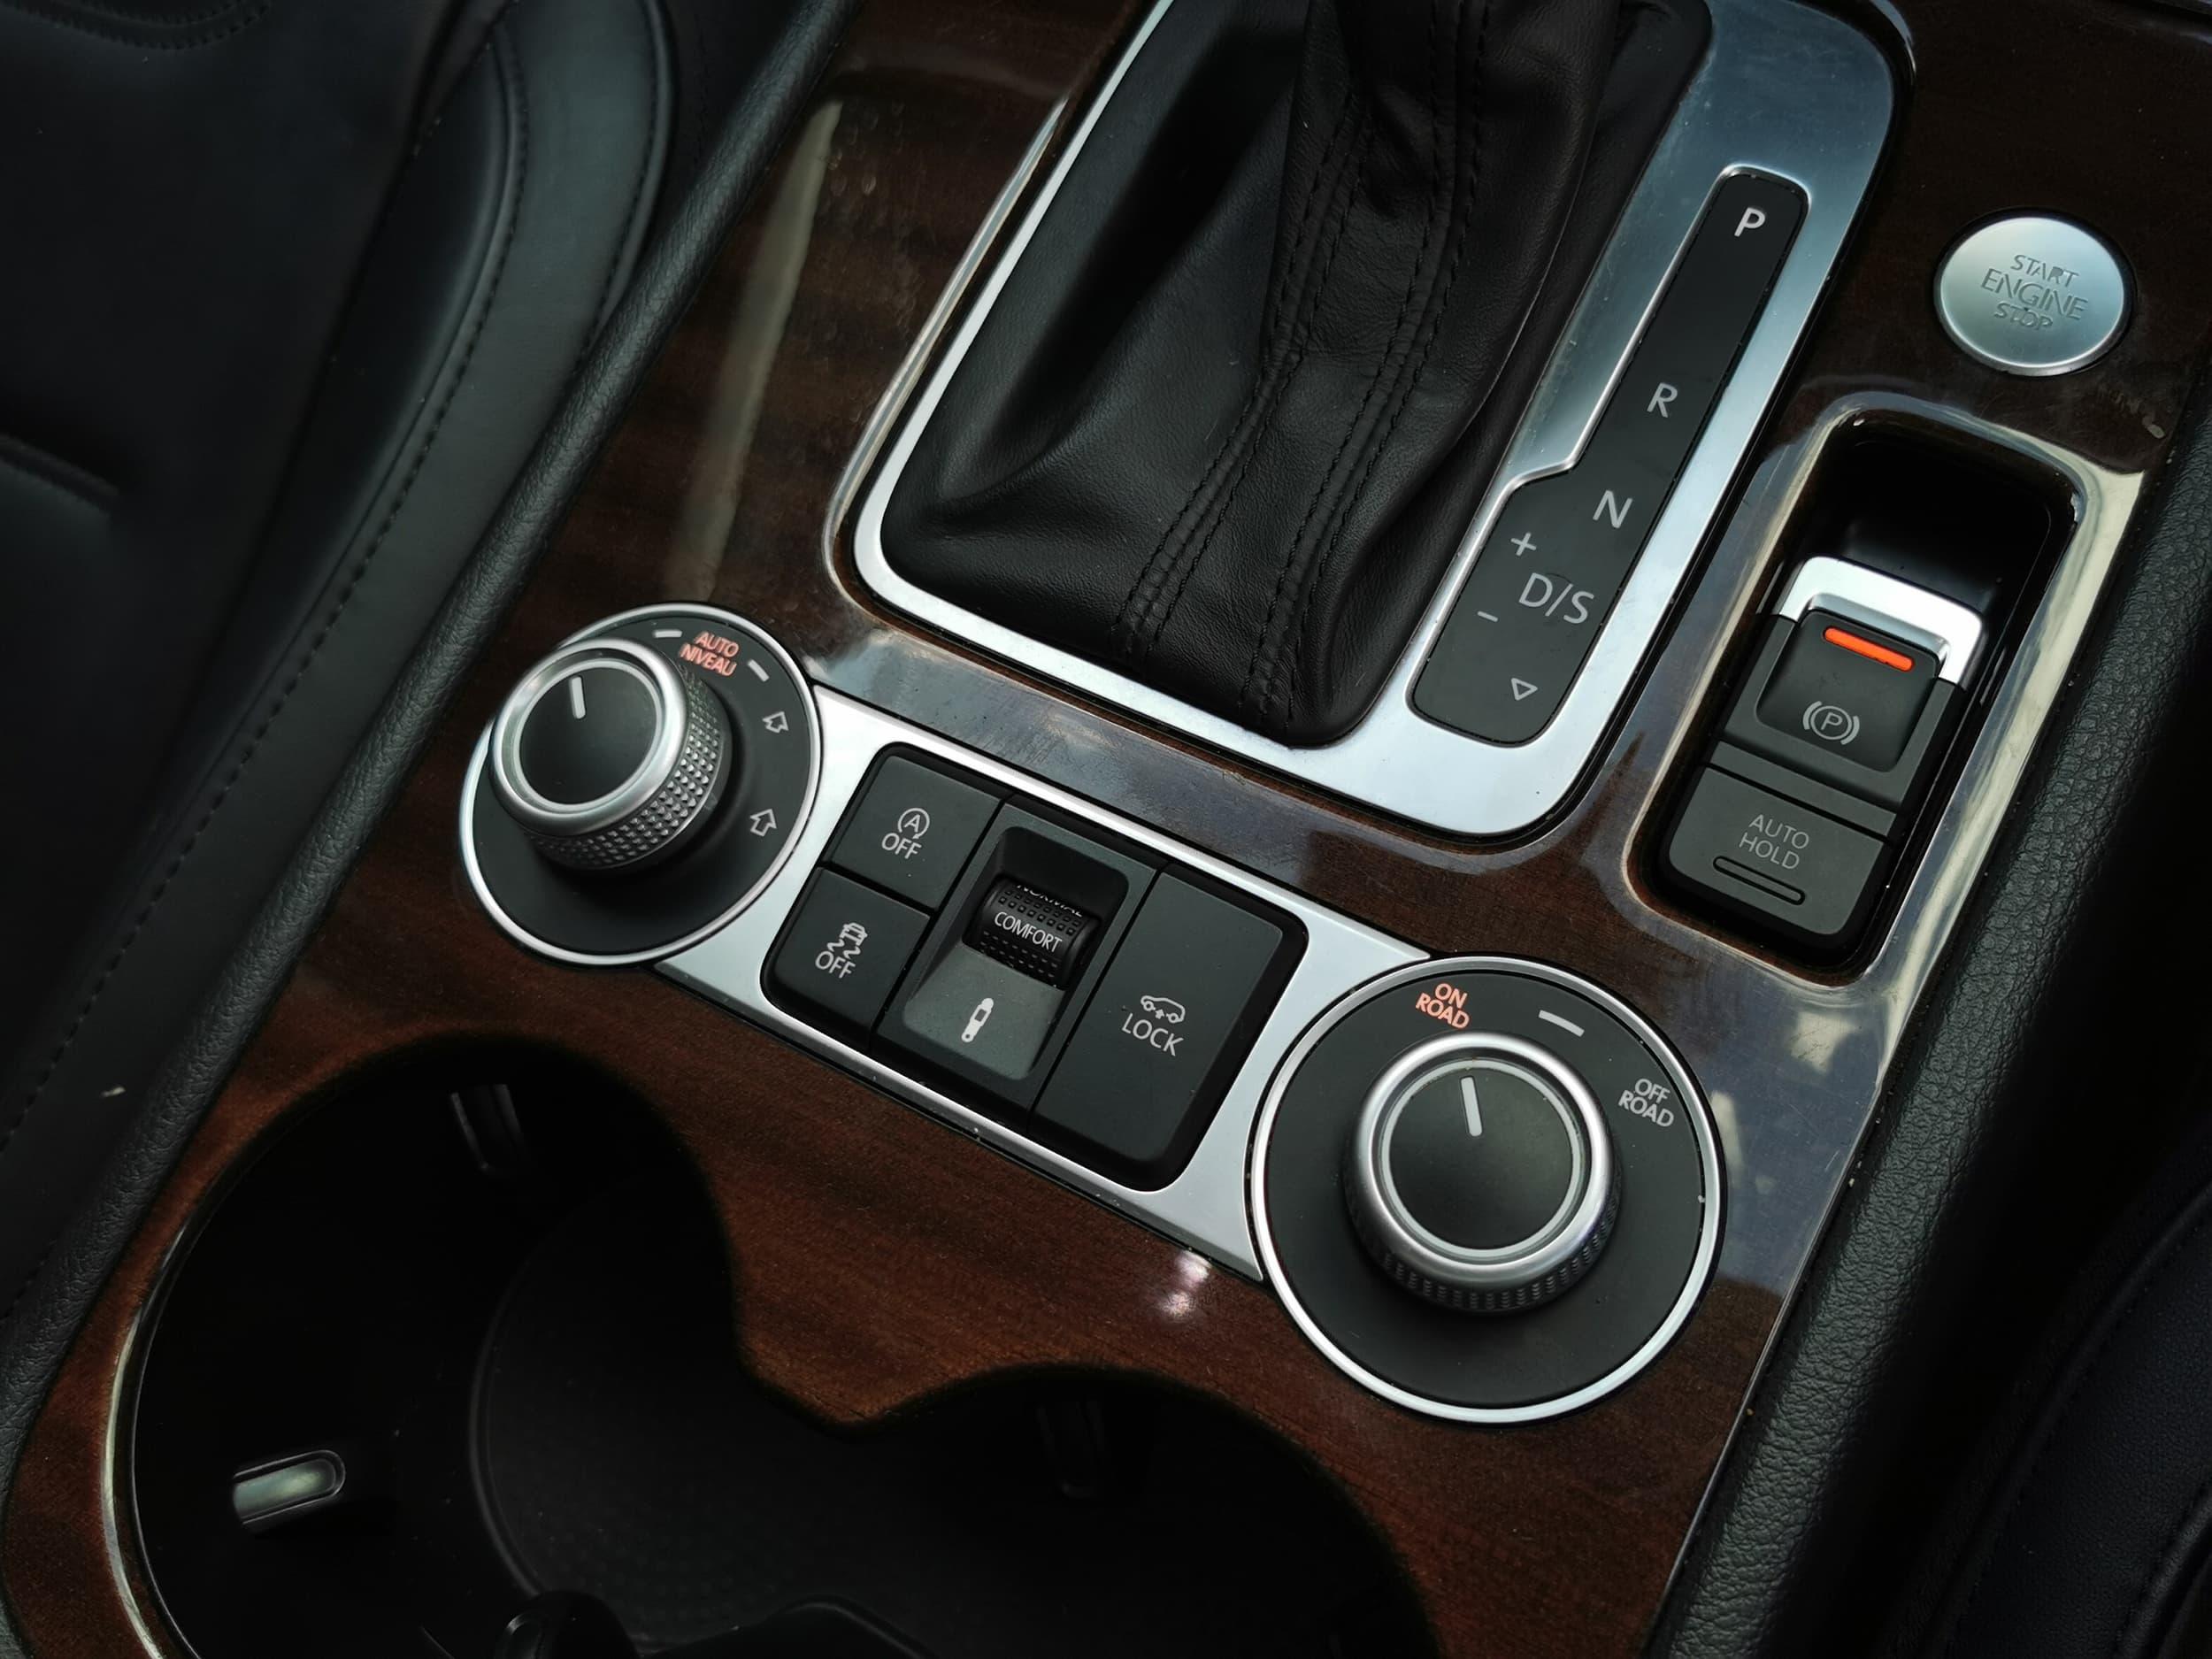 2015 Volkswagen Touareg V6 TDI 7P Auto 4MOTION MY16 - image 16